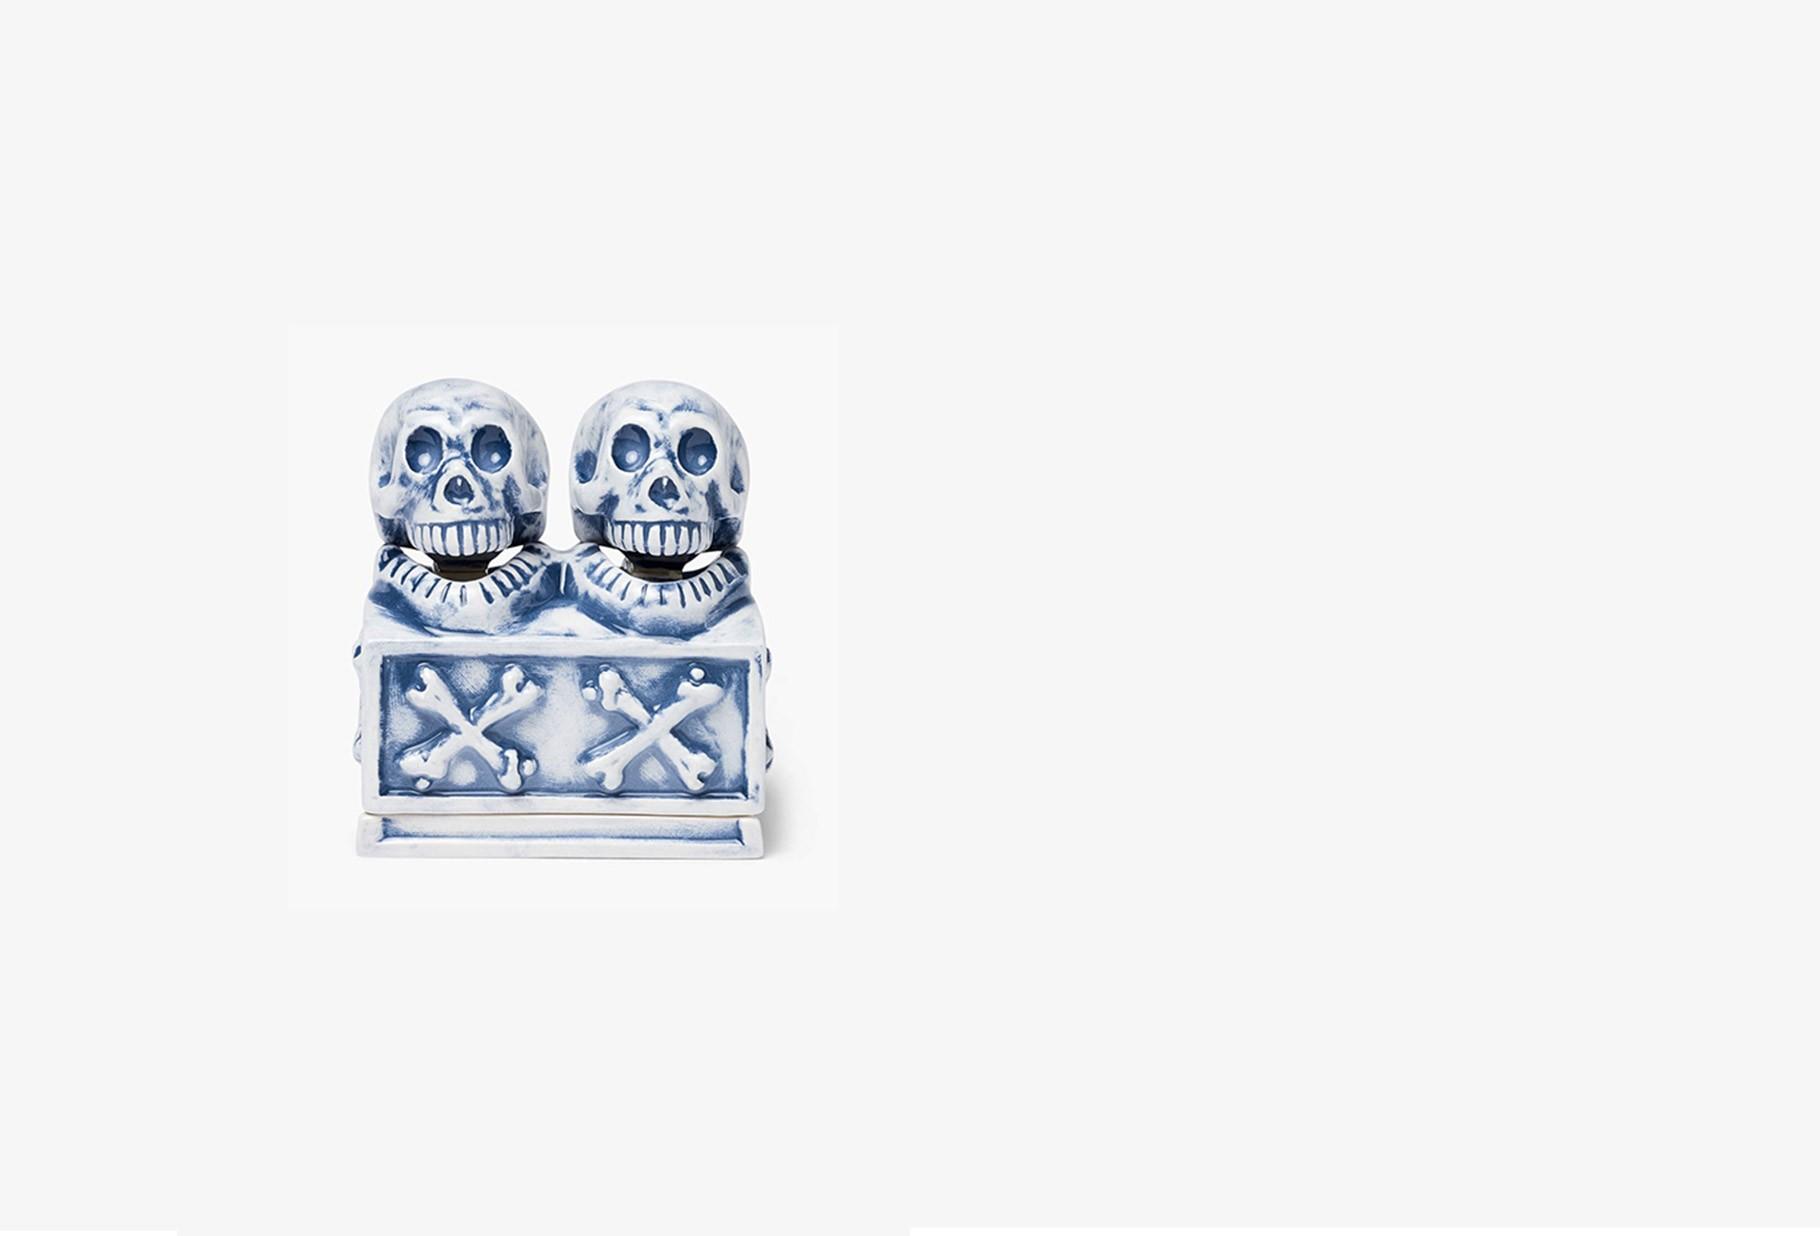 NEIGHBORHOOD / Booze dual skull / ce-incense Blue